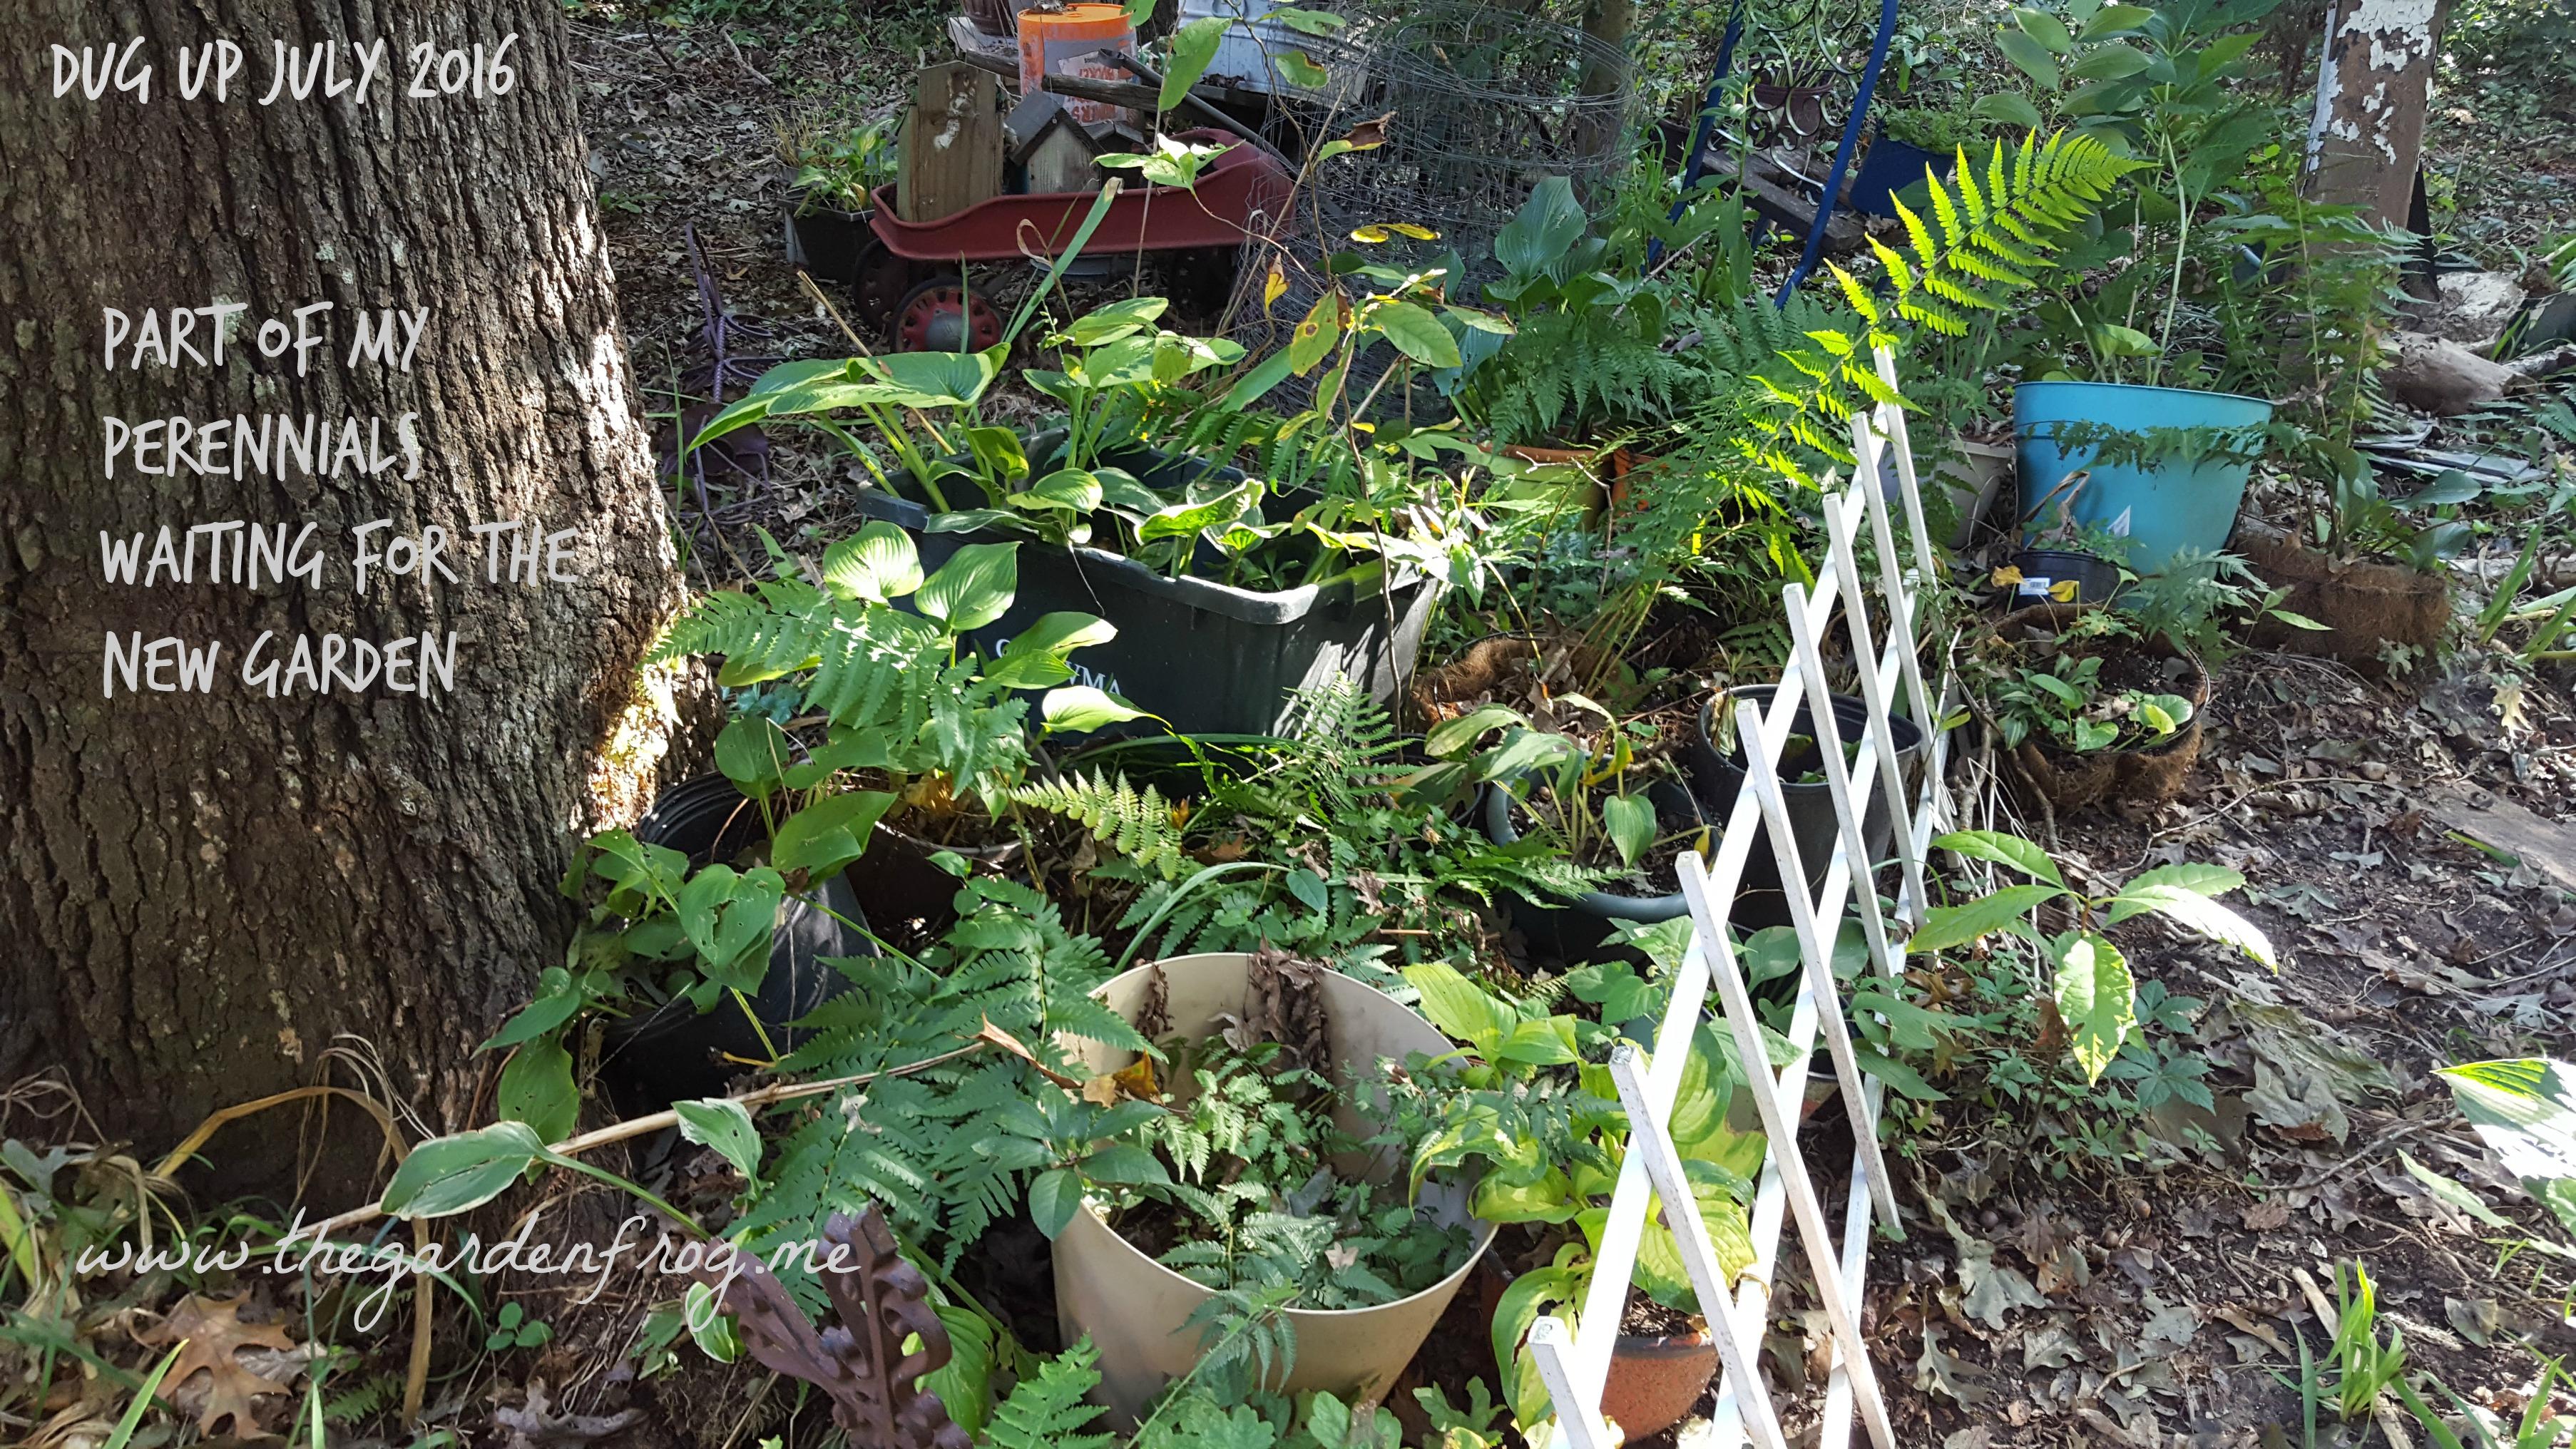 Dreaming of a new garden